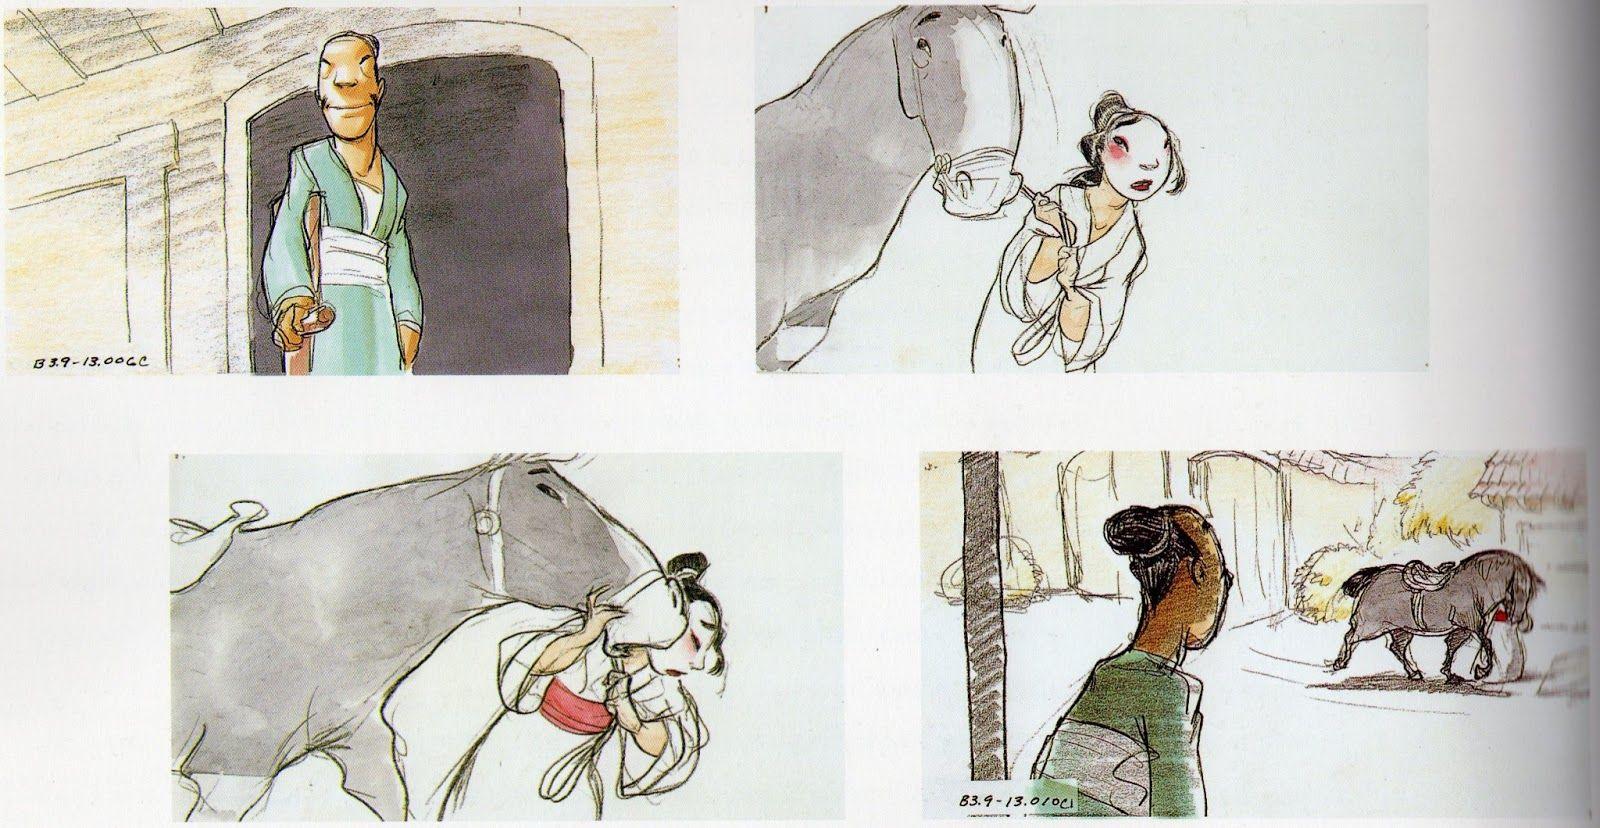 Mulan [Walt Disney - 1998] - Page 6 F964ccd5e40df01e5b3db0357a0091c3